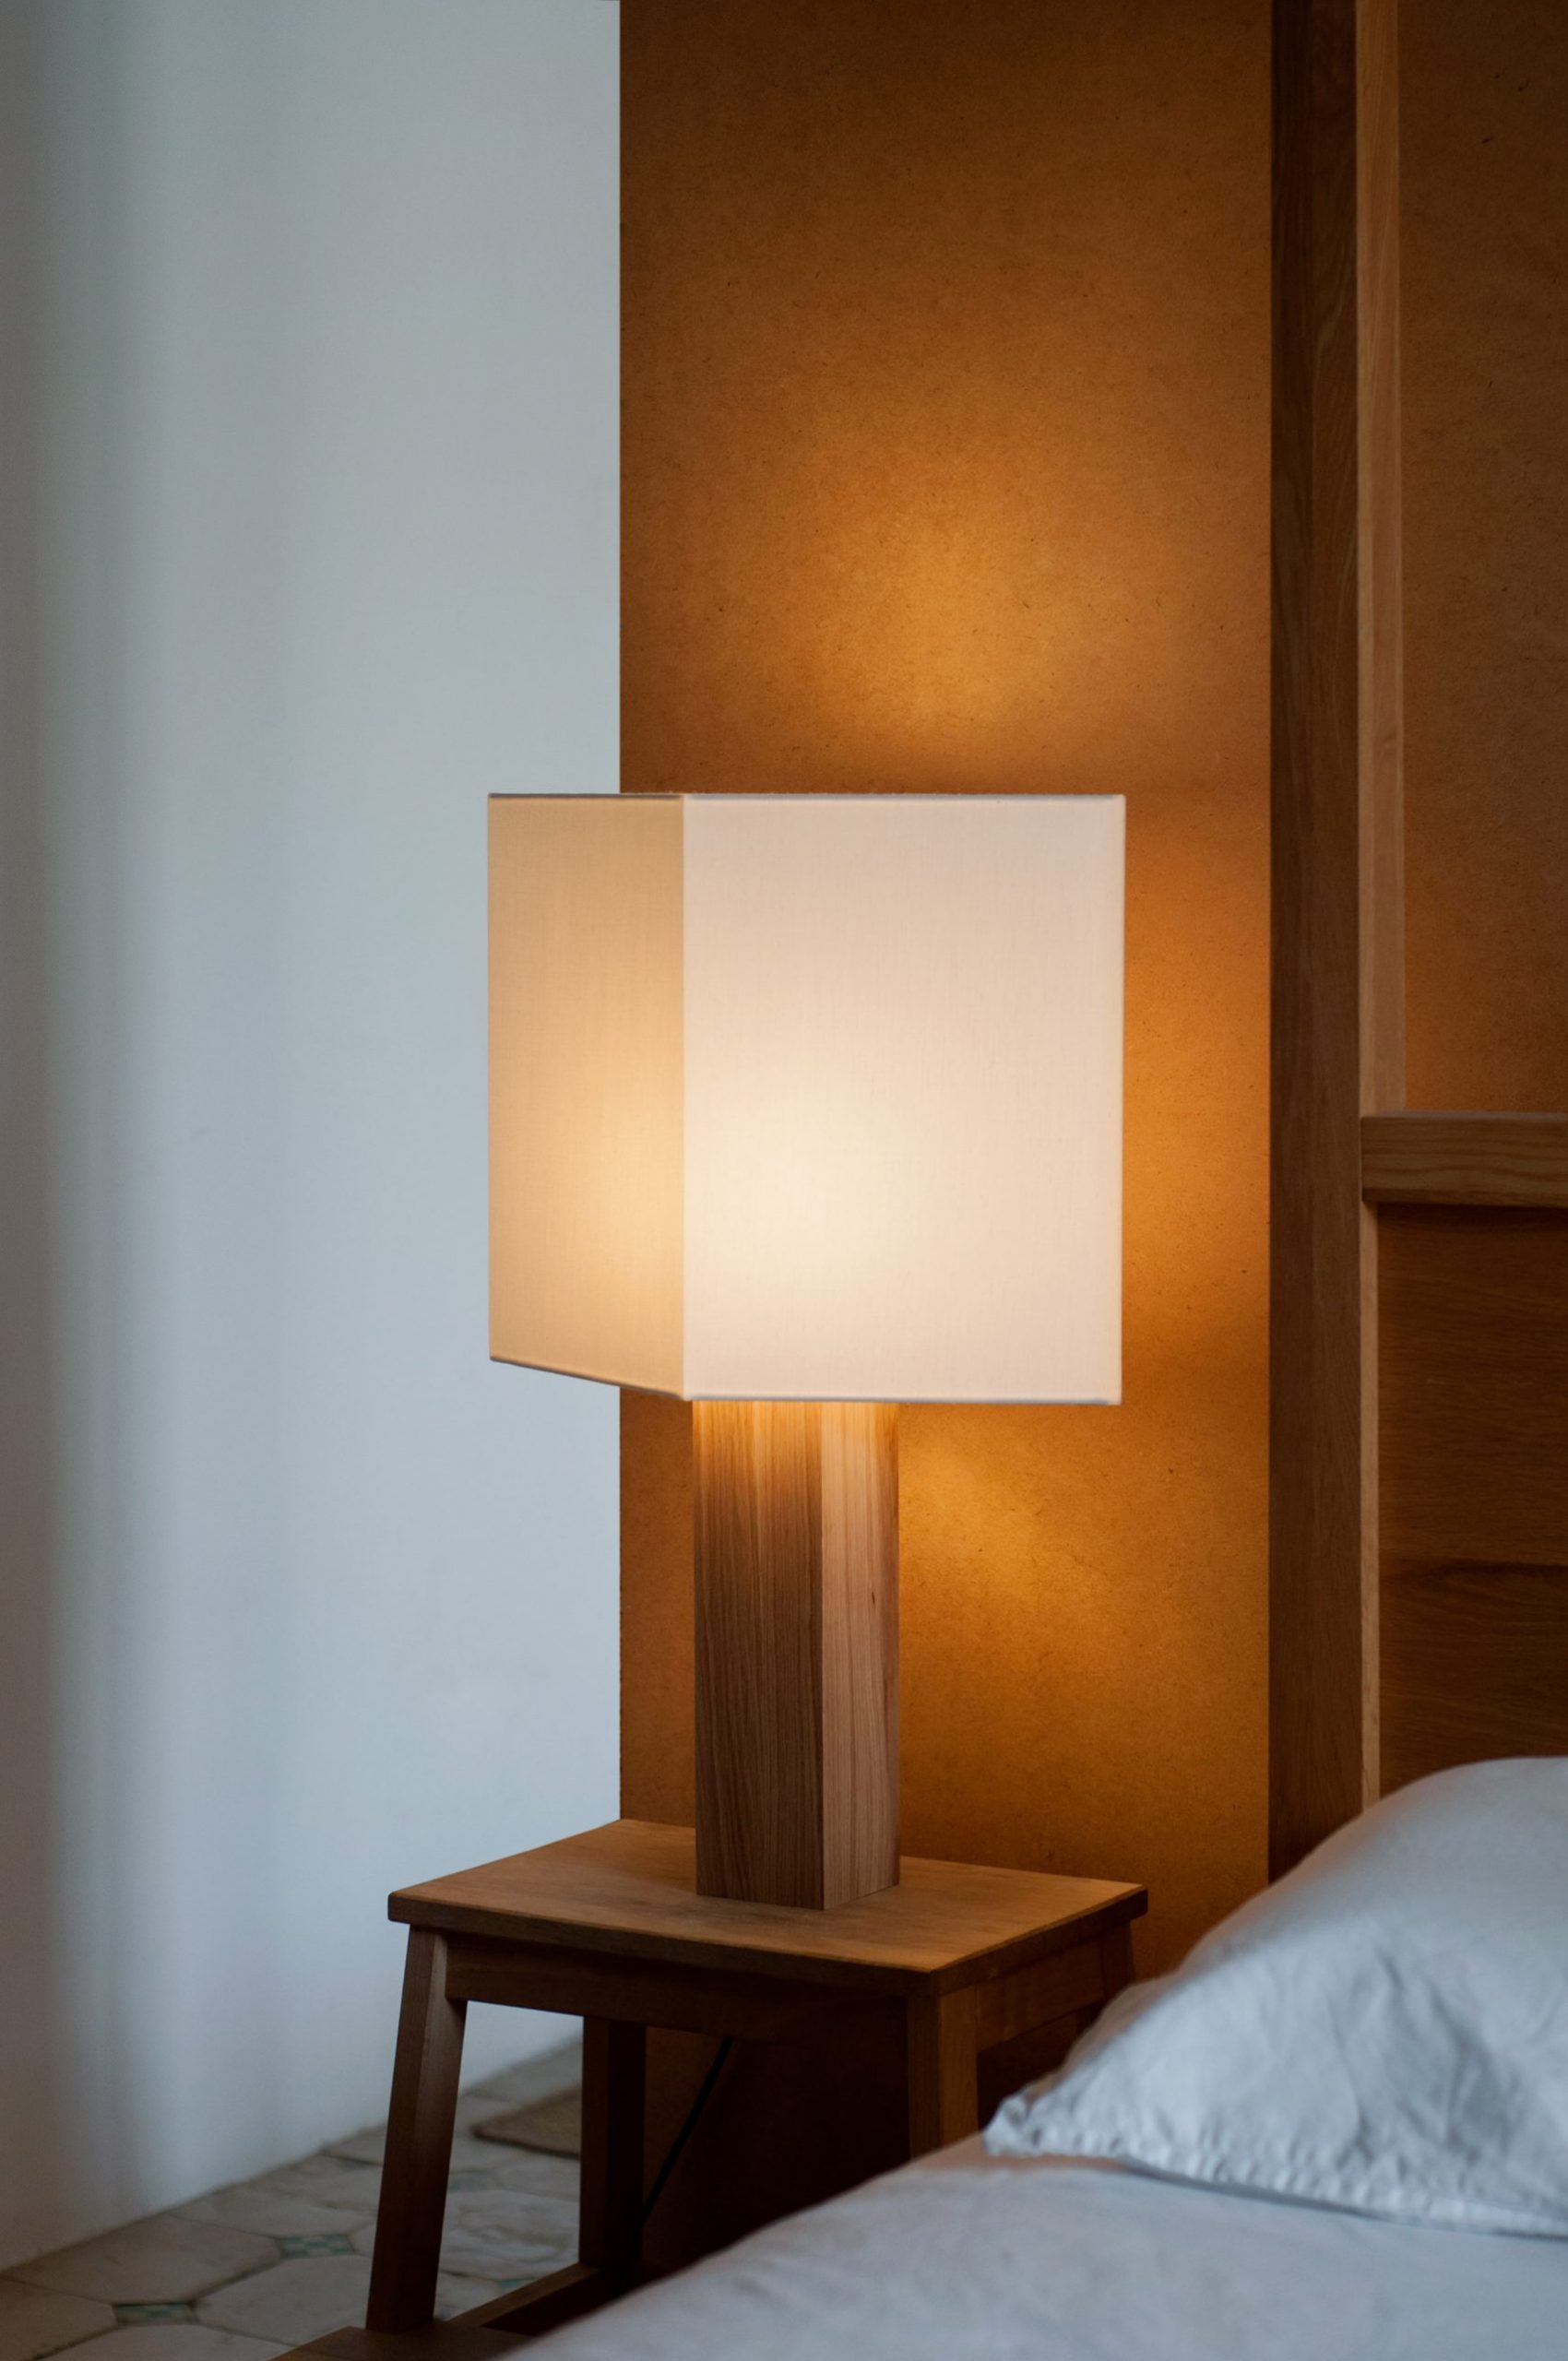 Chata Lamp 1